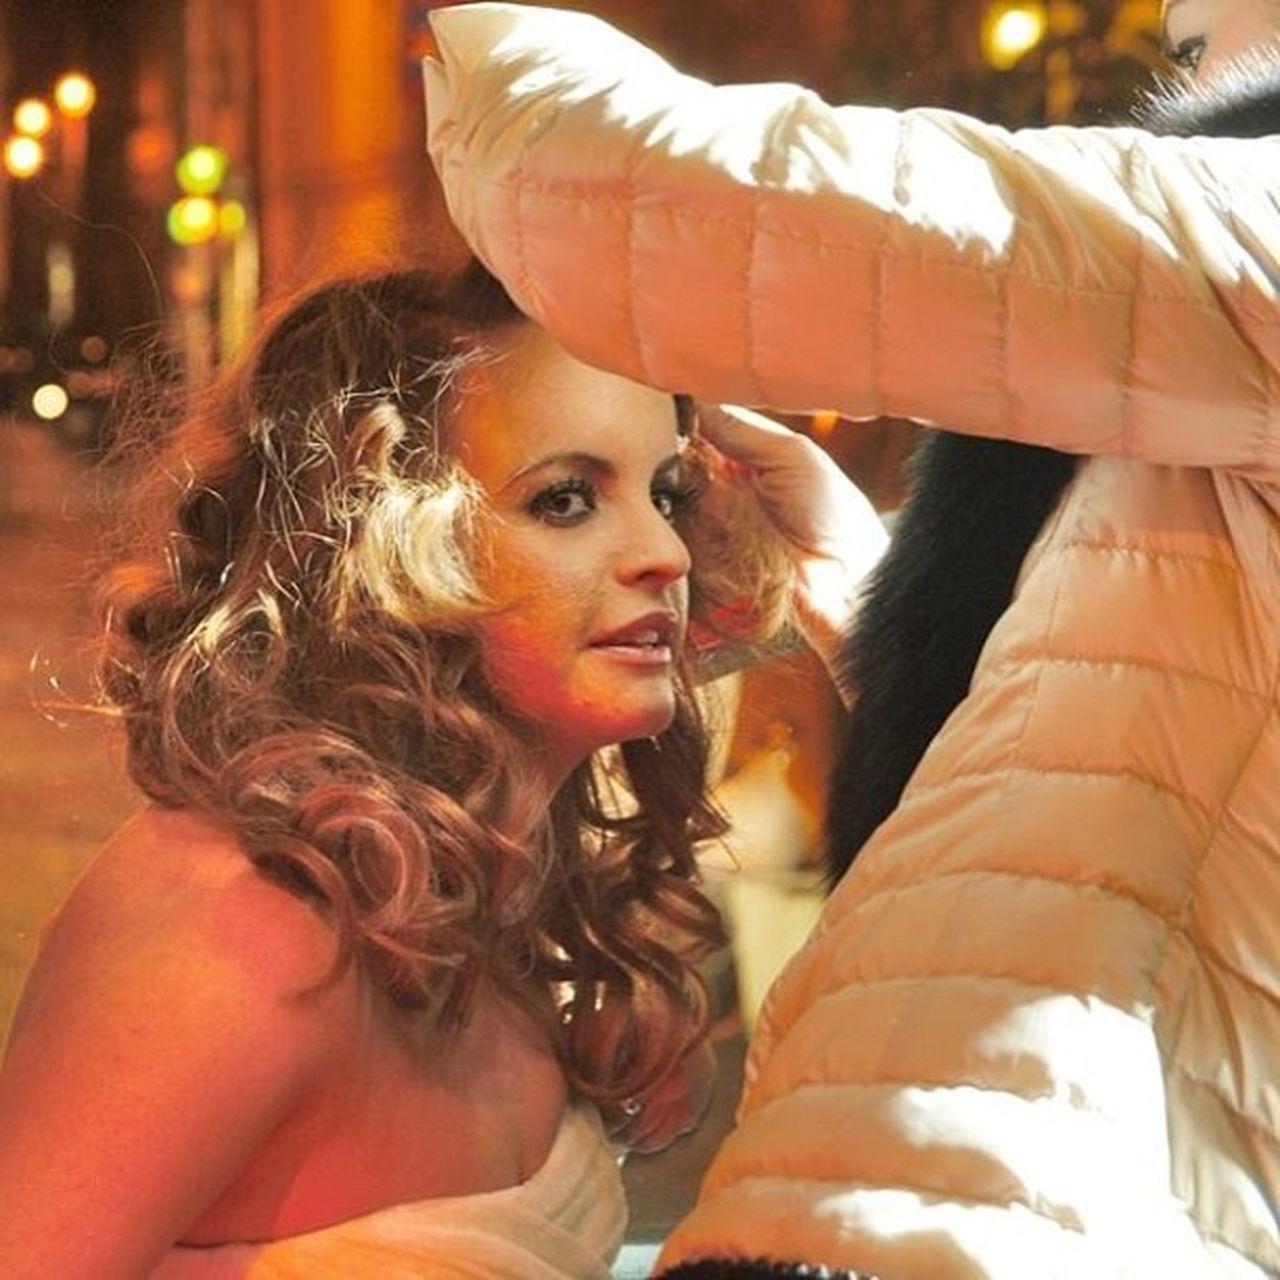 Wedding Alliance Hairstyle Curly Blonde Shatush Dress Jesuspeirò Tulle Seta Polkadots Pois Roma Winter 2013